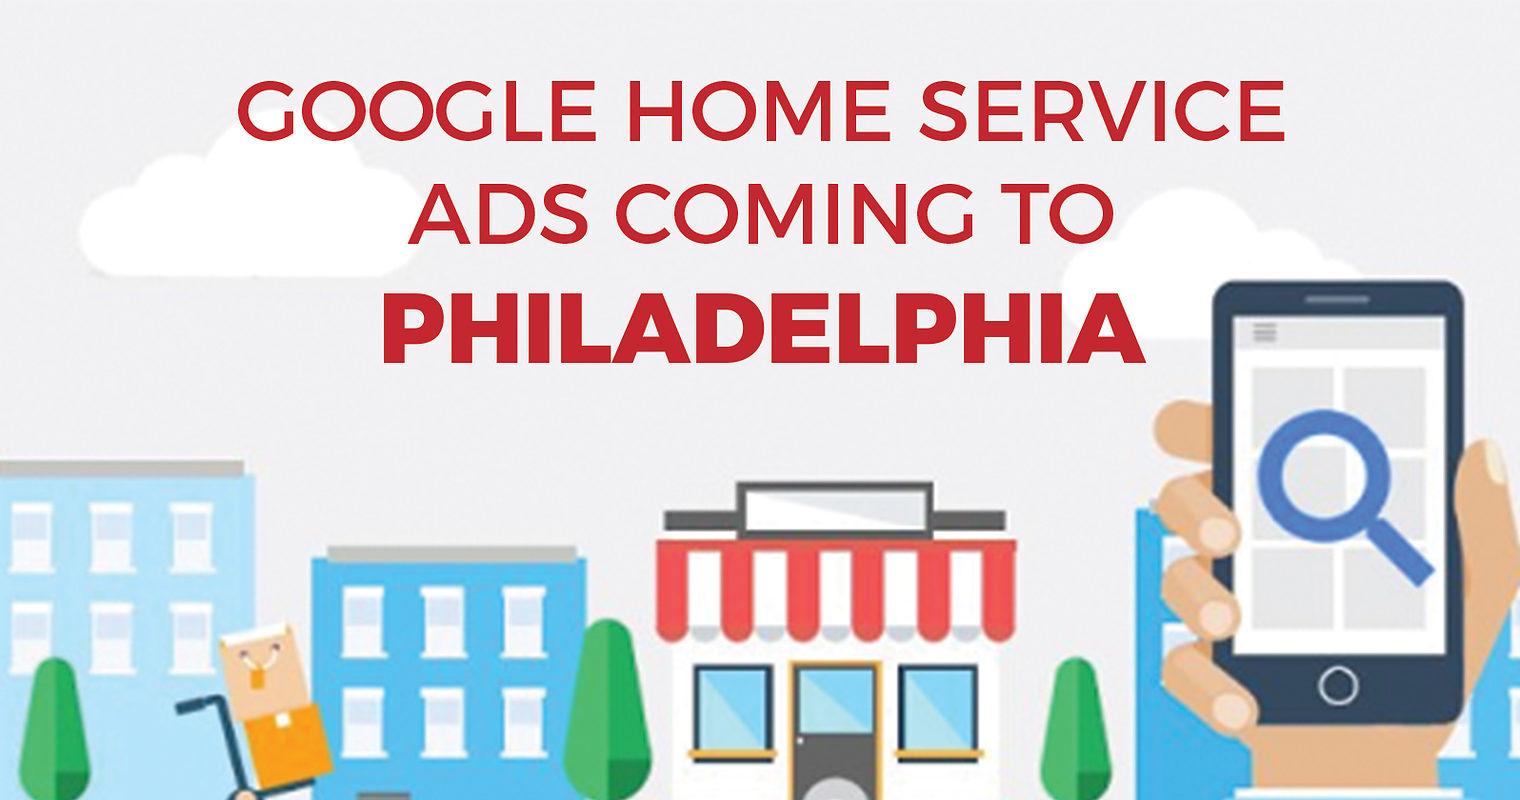 Google Home Service Ads Expanding to East Coast